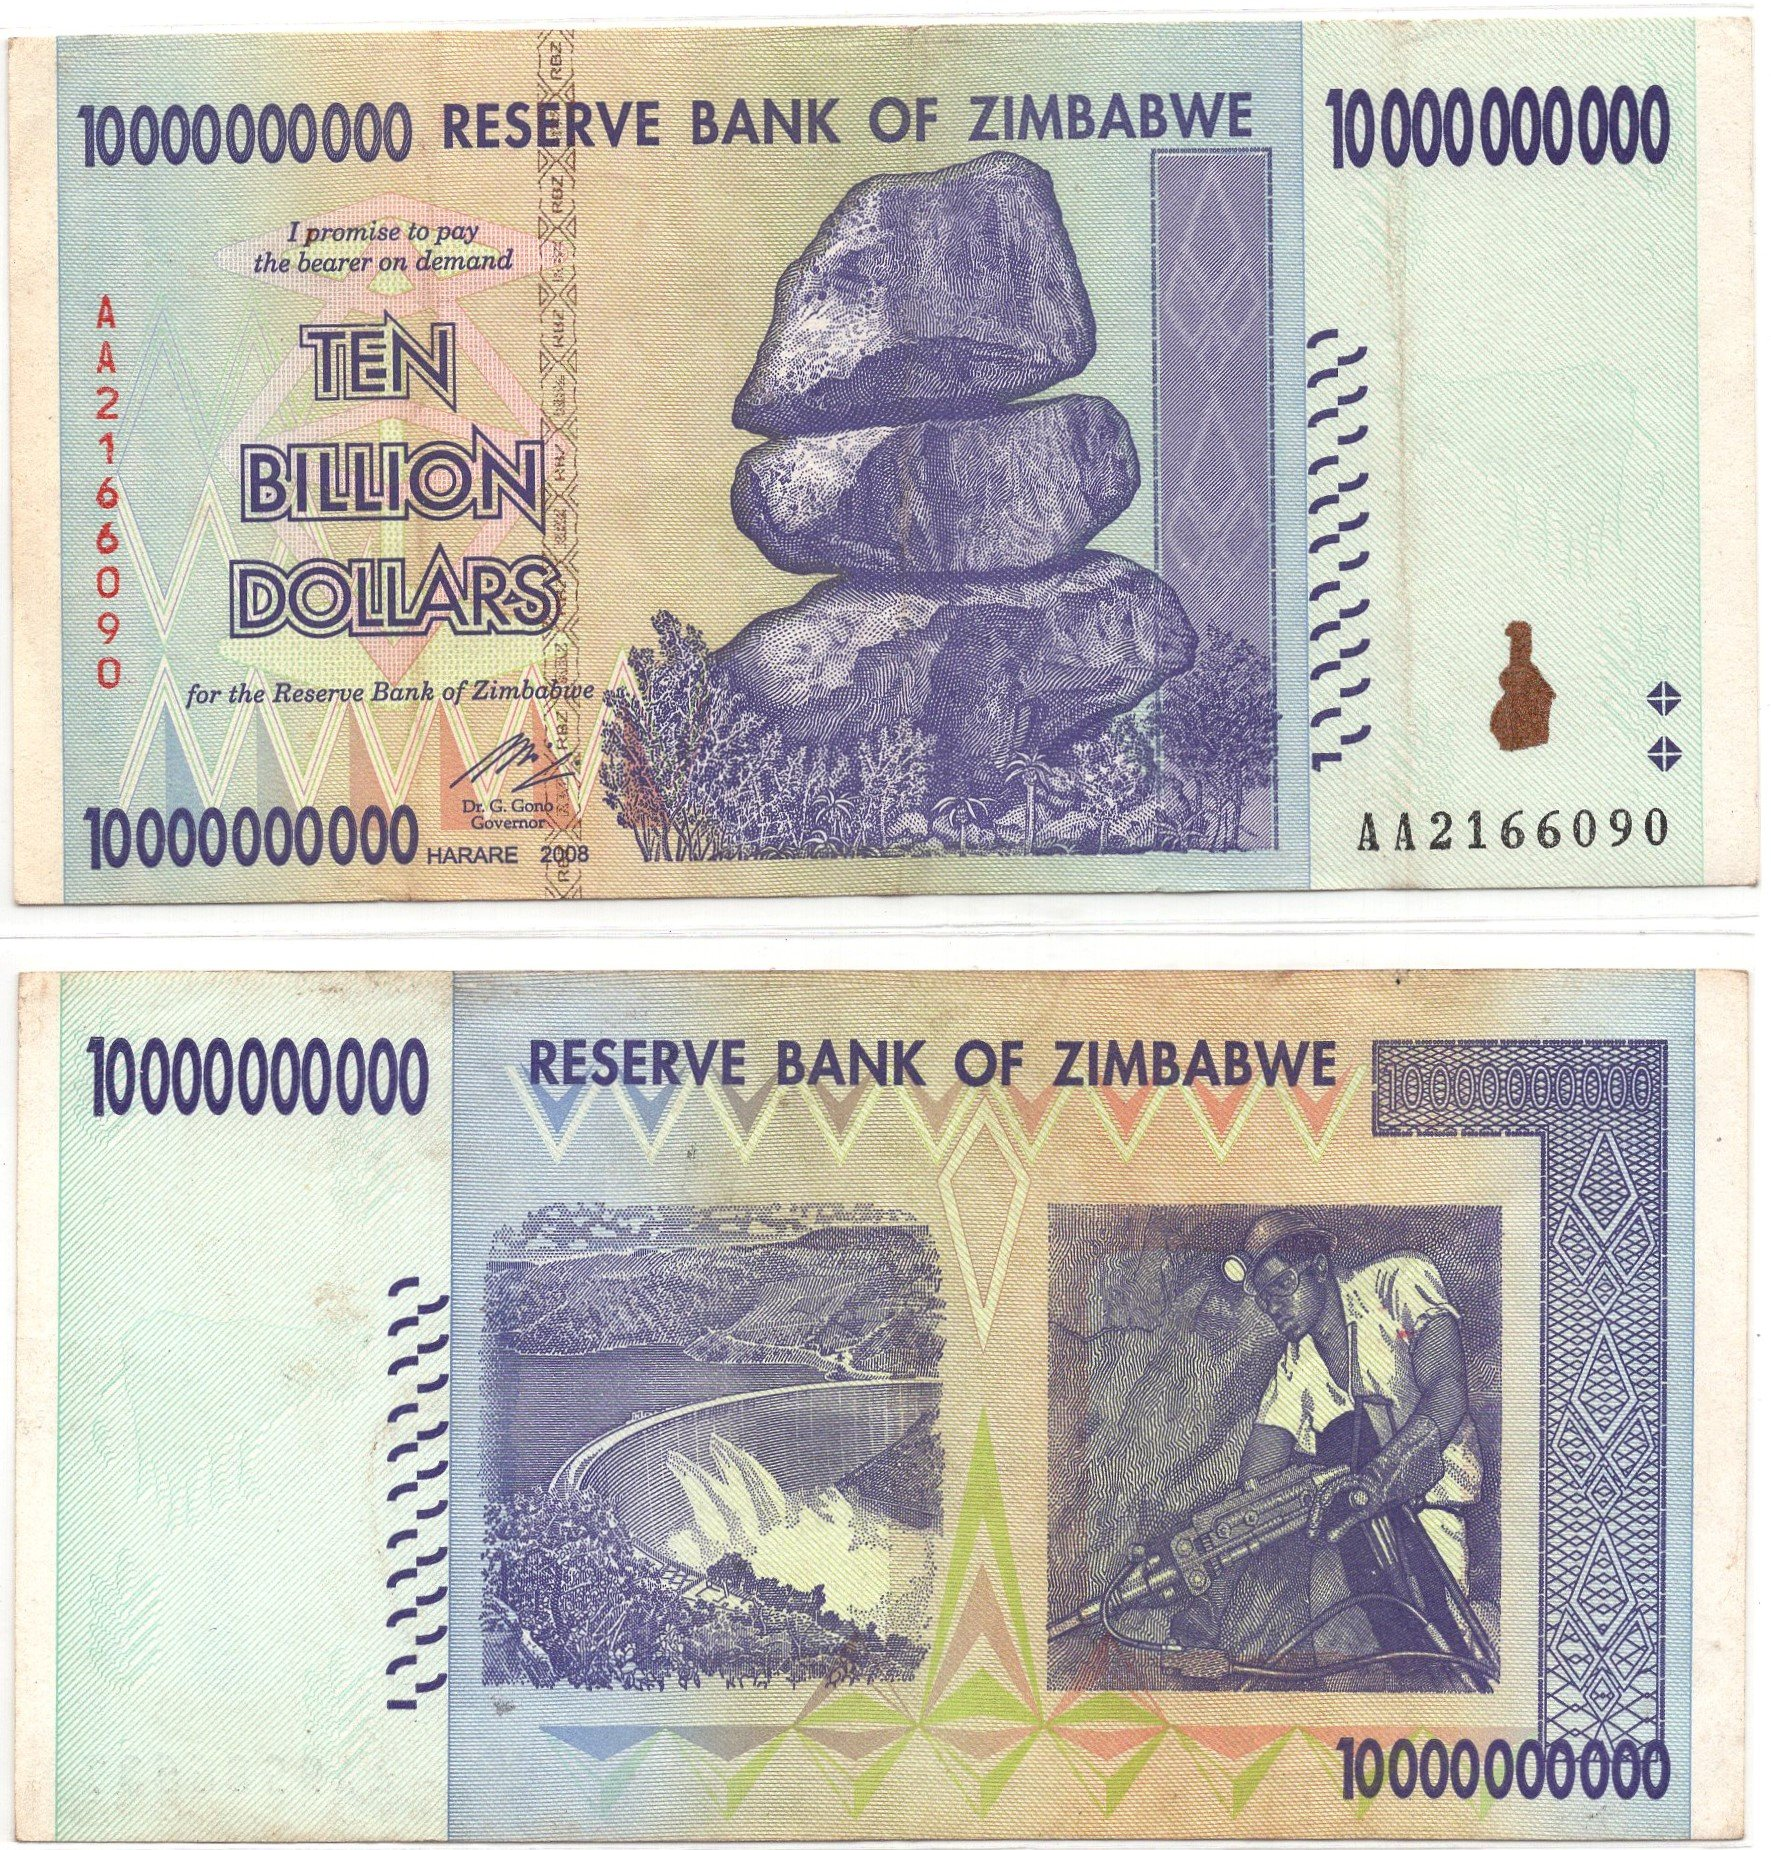 zimbabwe 10billion 2008